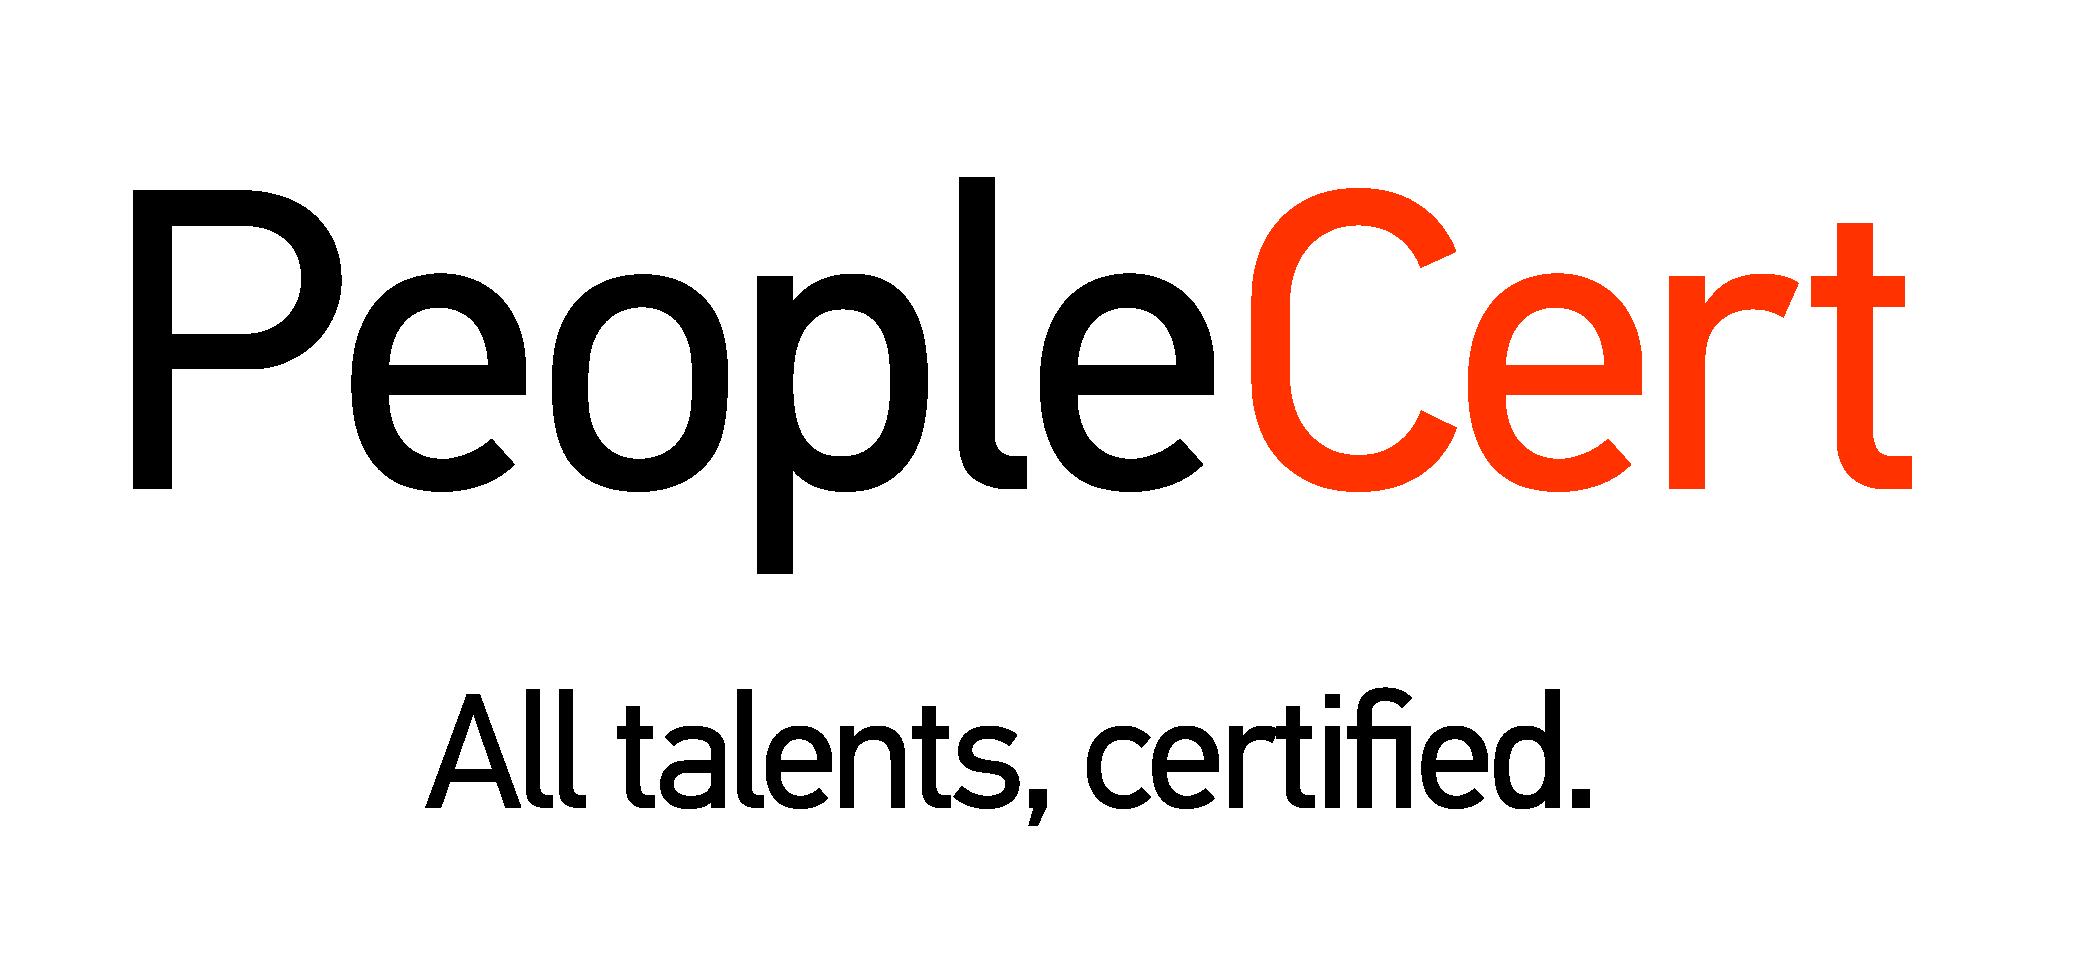 PeopleCert logo